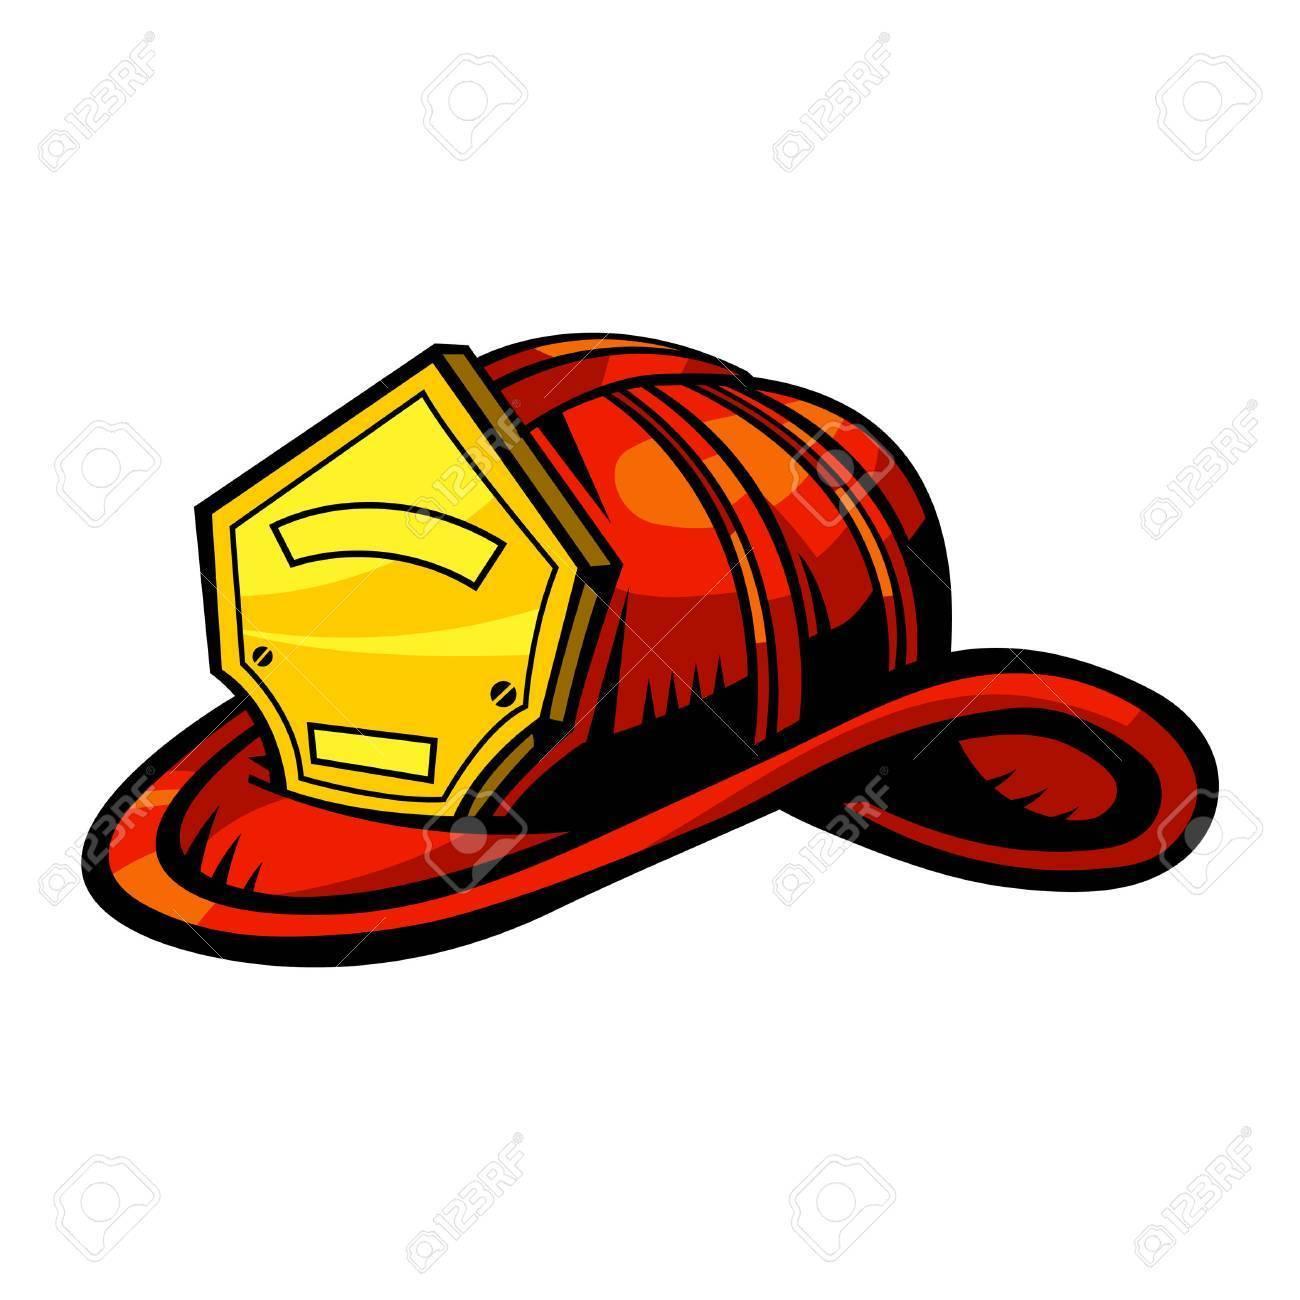 Firefighter helmet clipart 5 » Clipart Portal.